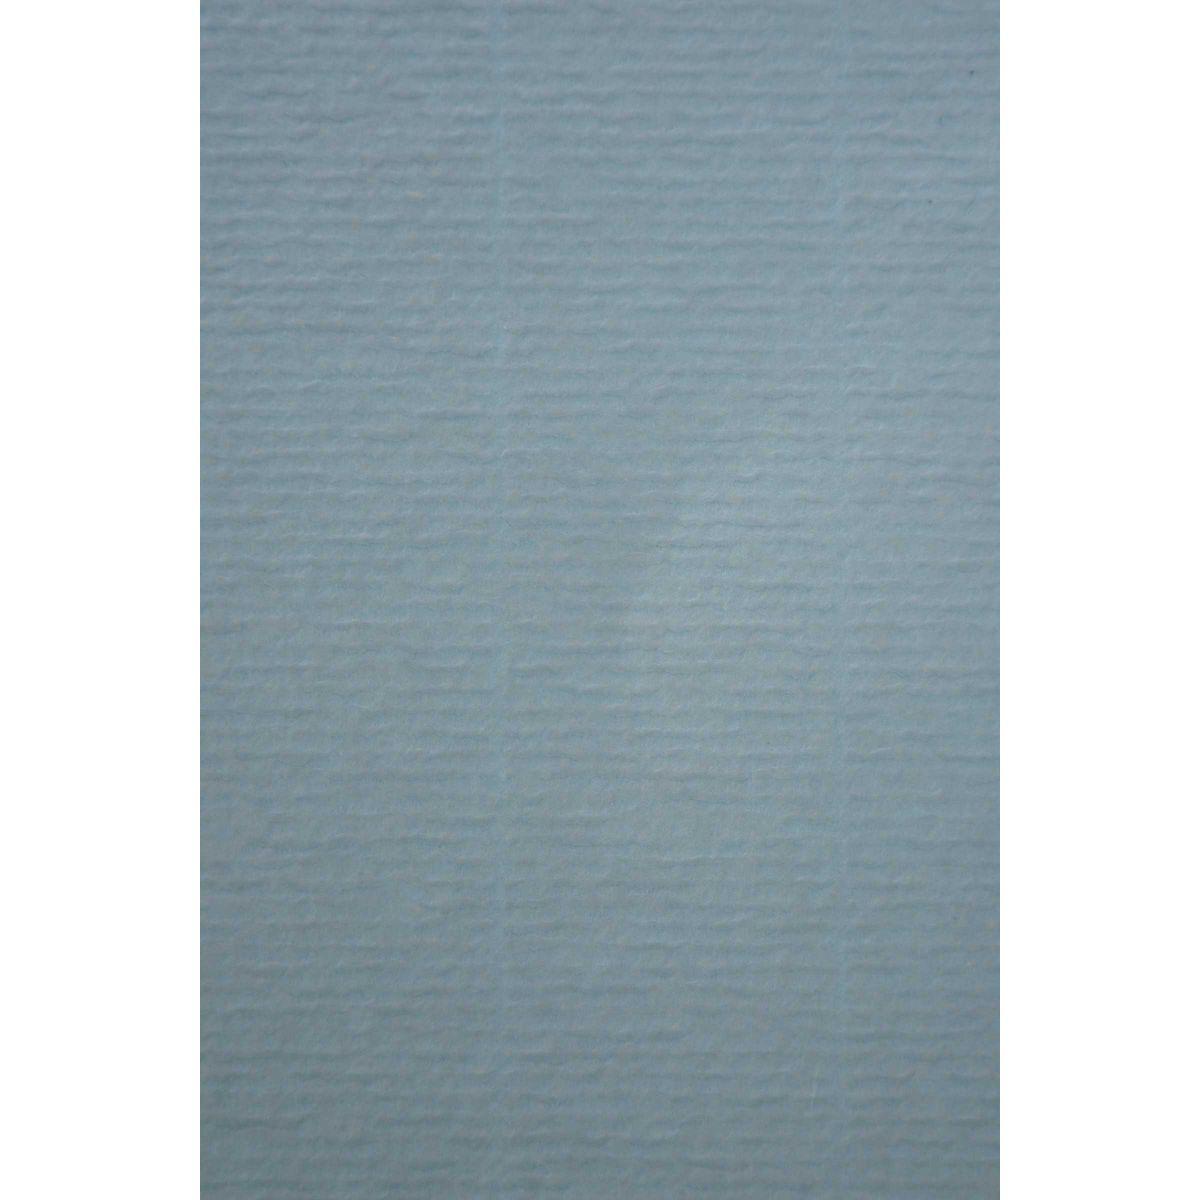 Papel Vergê Plus Água Marinha - 180g